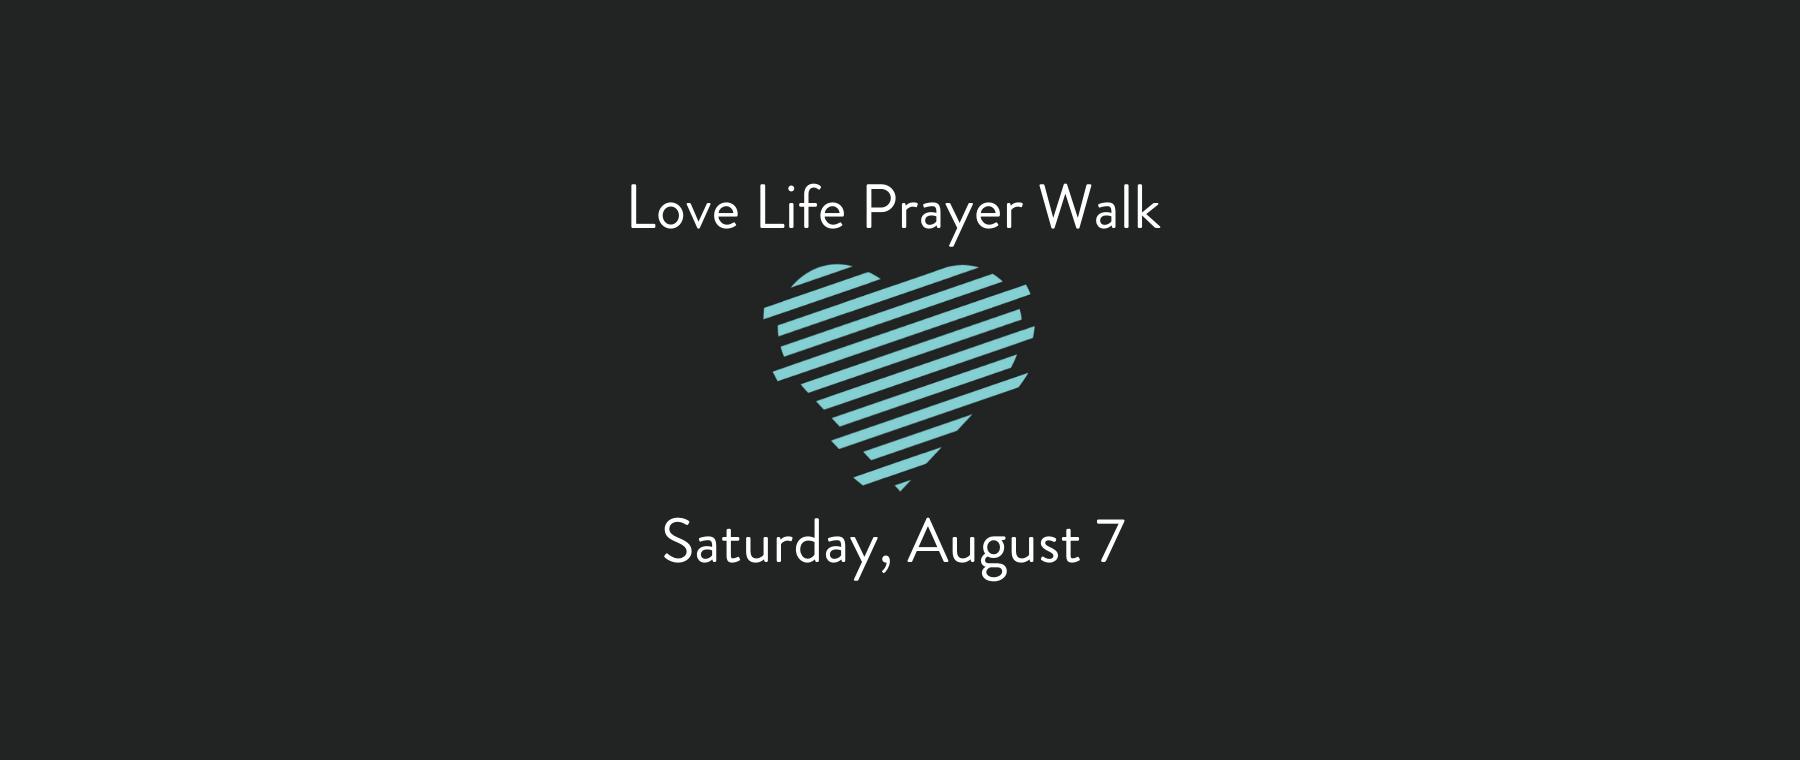 Love Life Prayer Walk